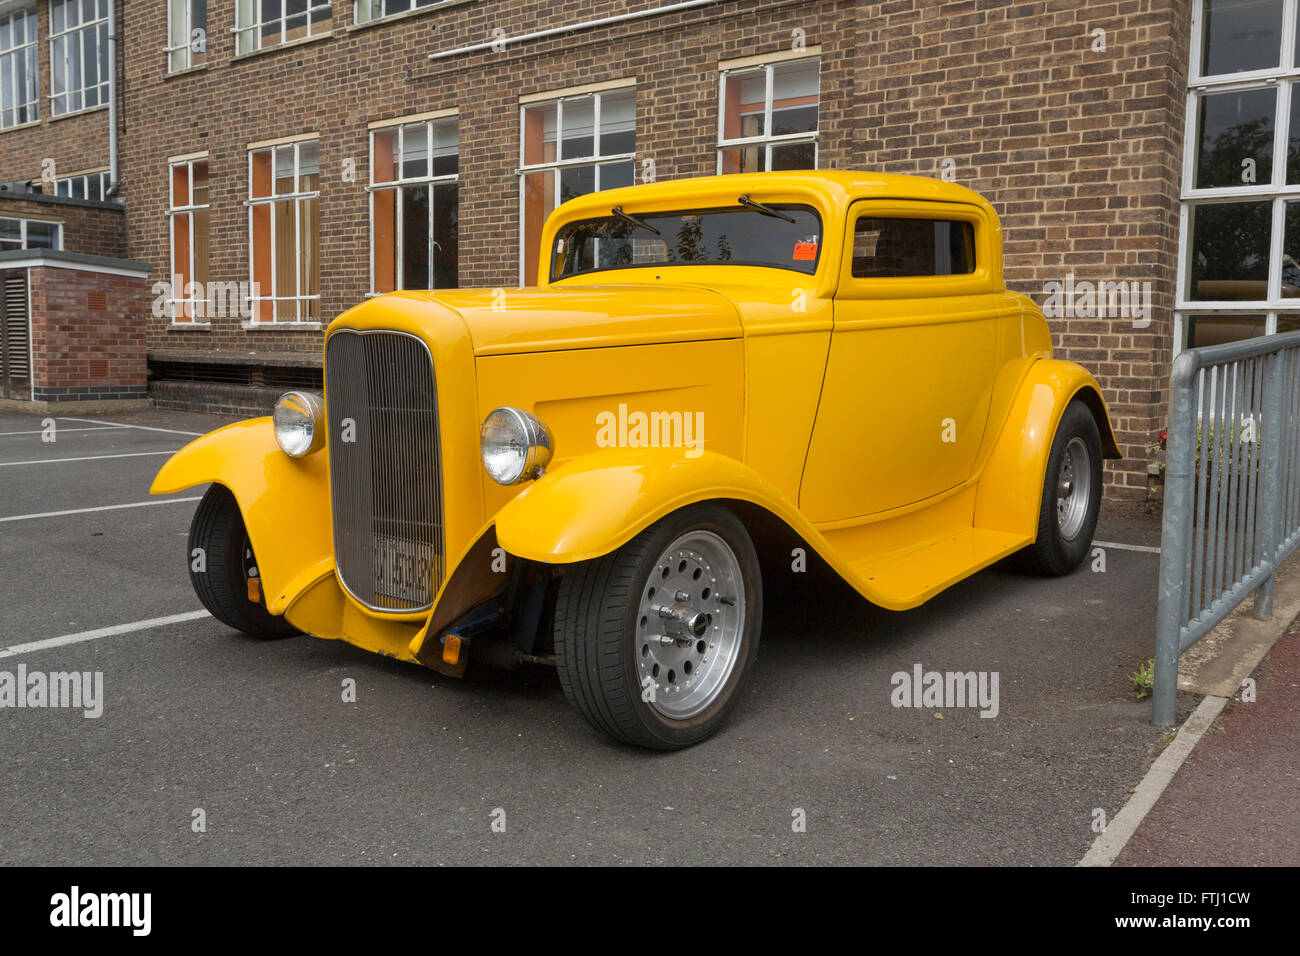 yellow custom car in the UK - Stock Image